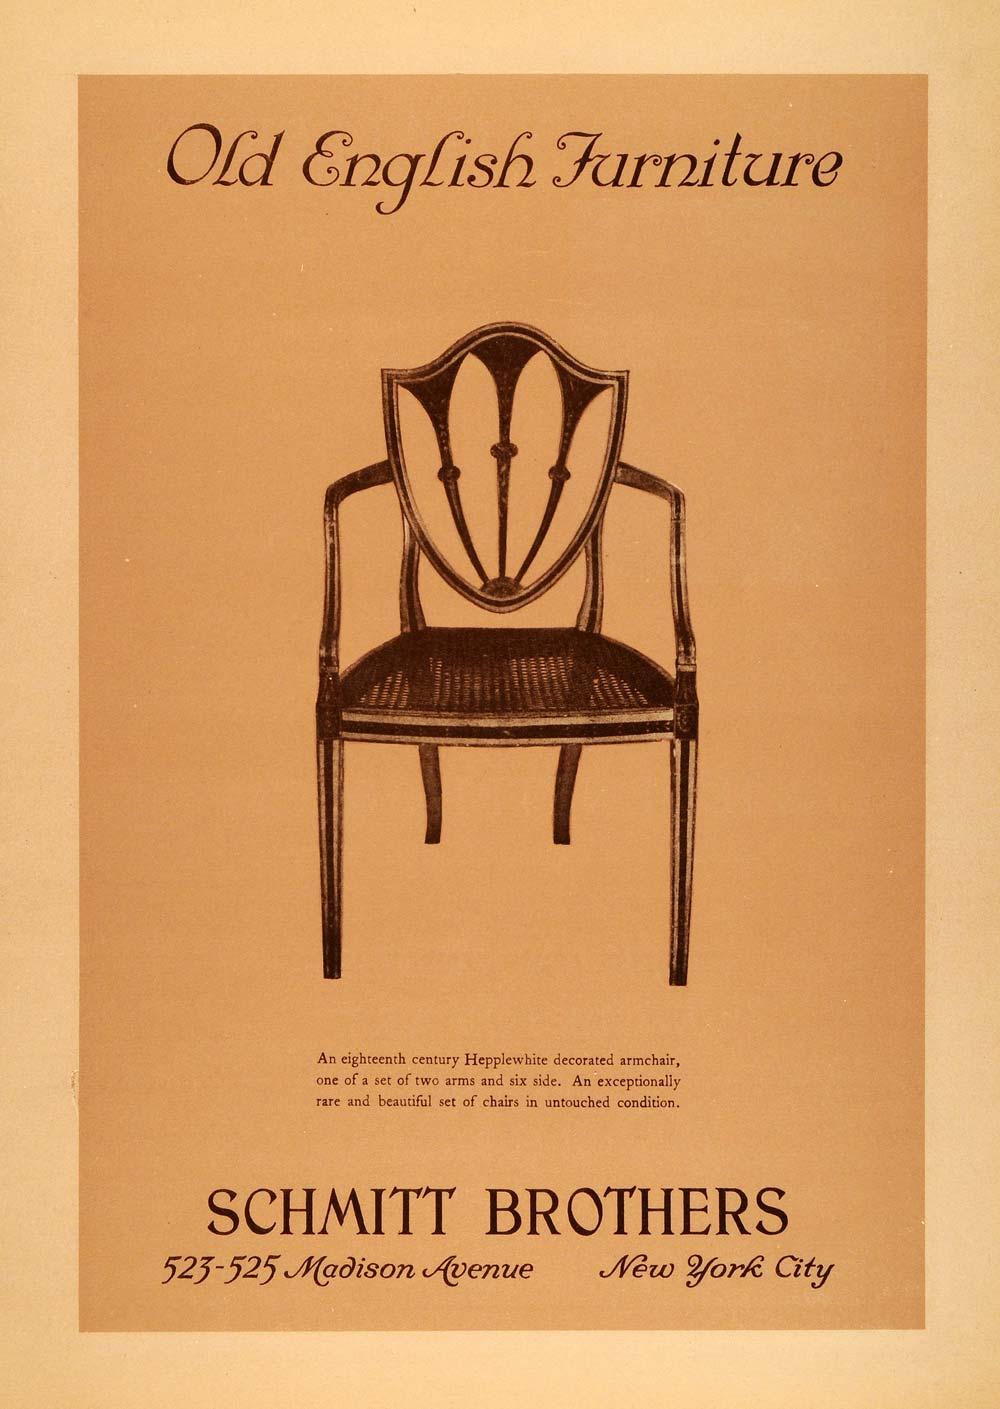 1925 Ad Schmitt Brothers Old English Furniture Wooden Hepplewhite Armchair Decor Ebay